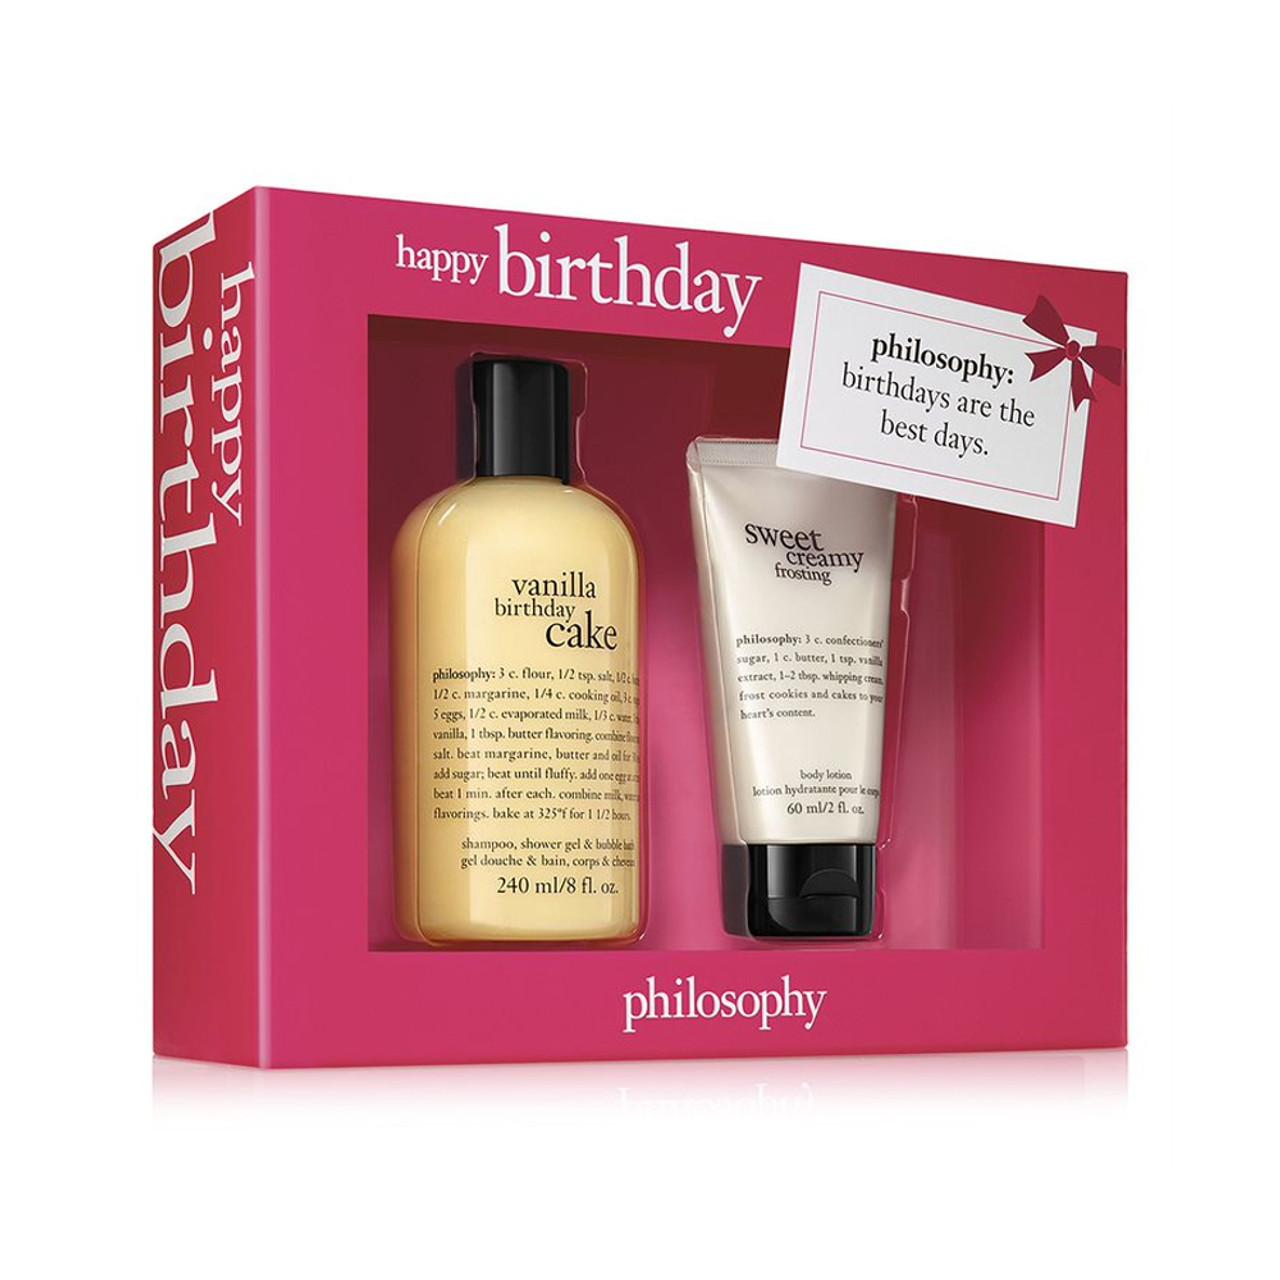 philosophy Happy Birthday Set BeautifiedYou.com